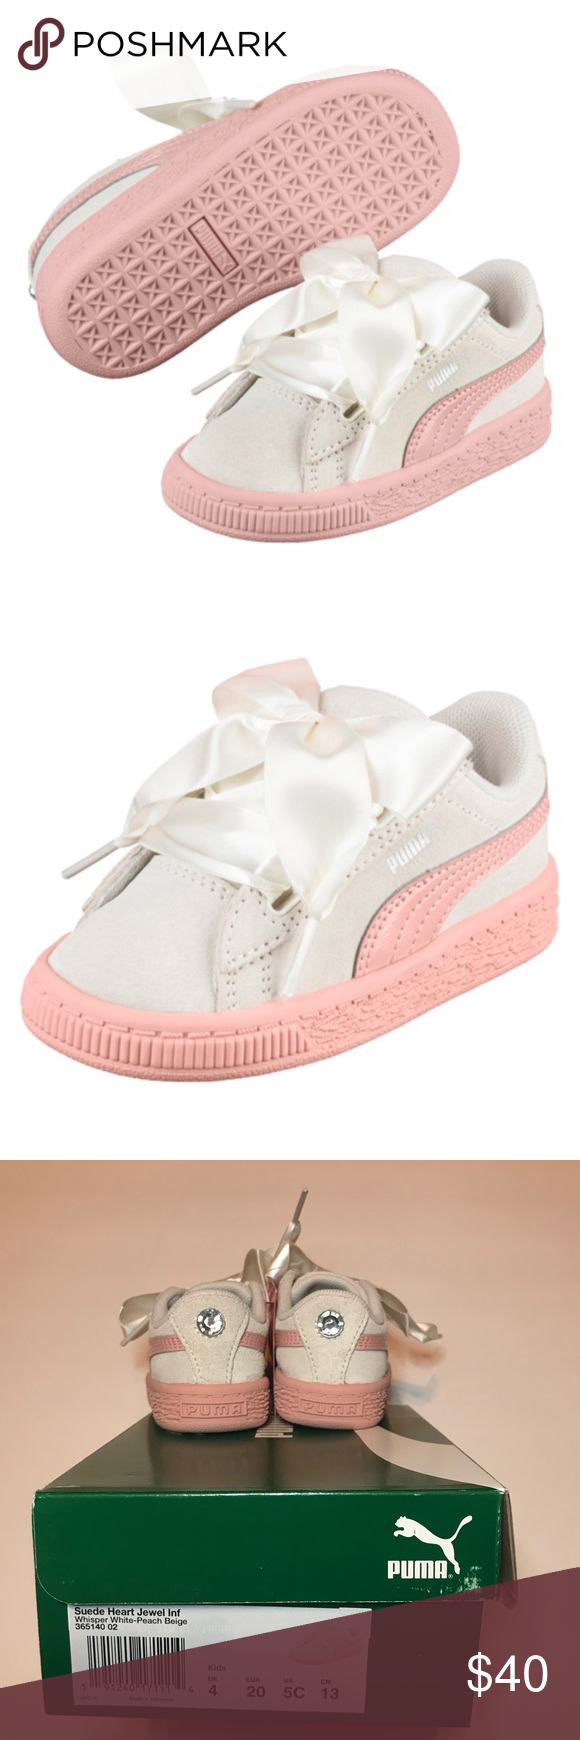 1d442f847f6 Puma Suede Heart Jewel Infant Sneakers Brand new  inbox Puma Suede Heart  Jewel Infant Sneakers